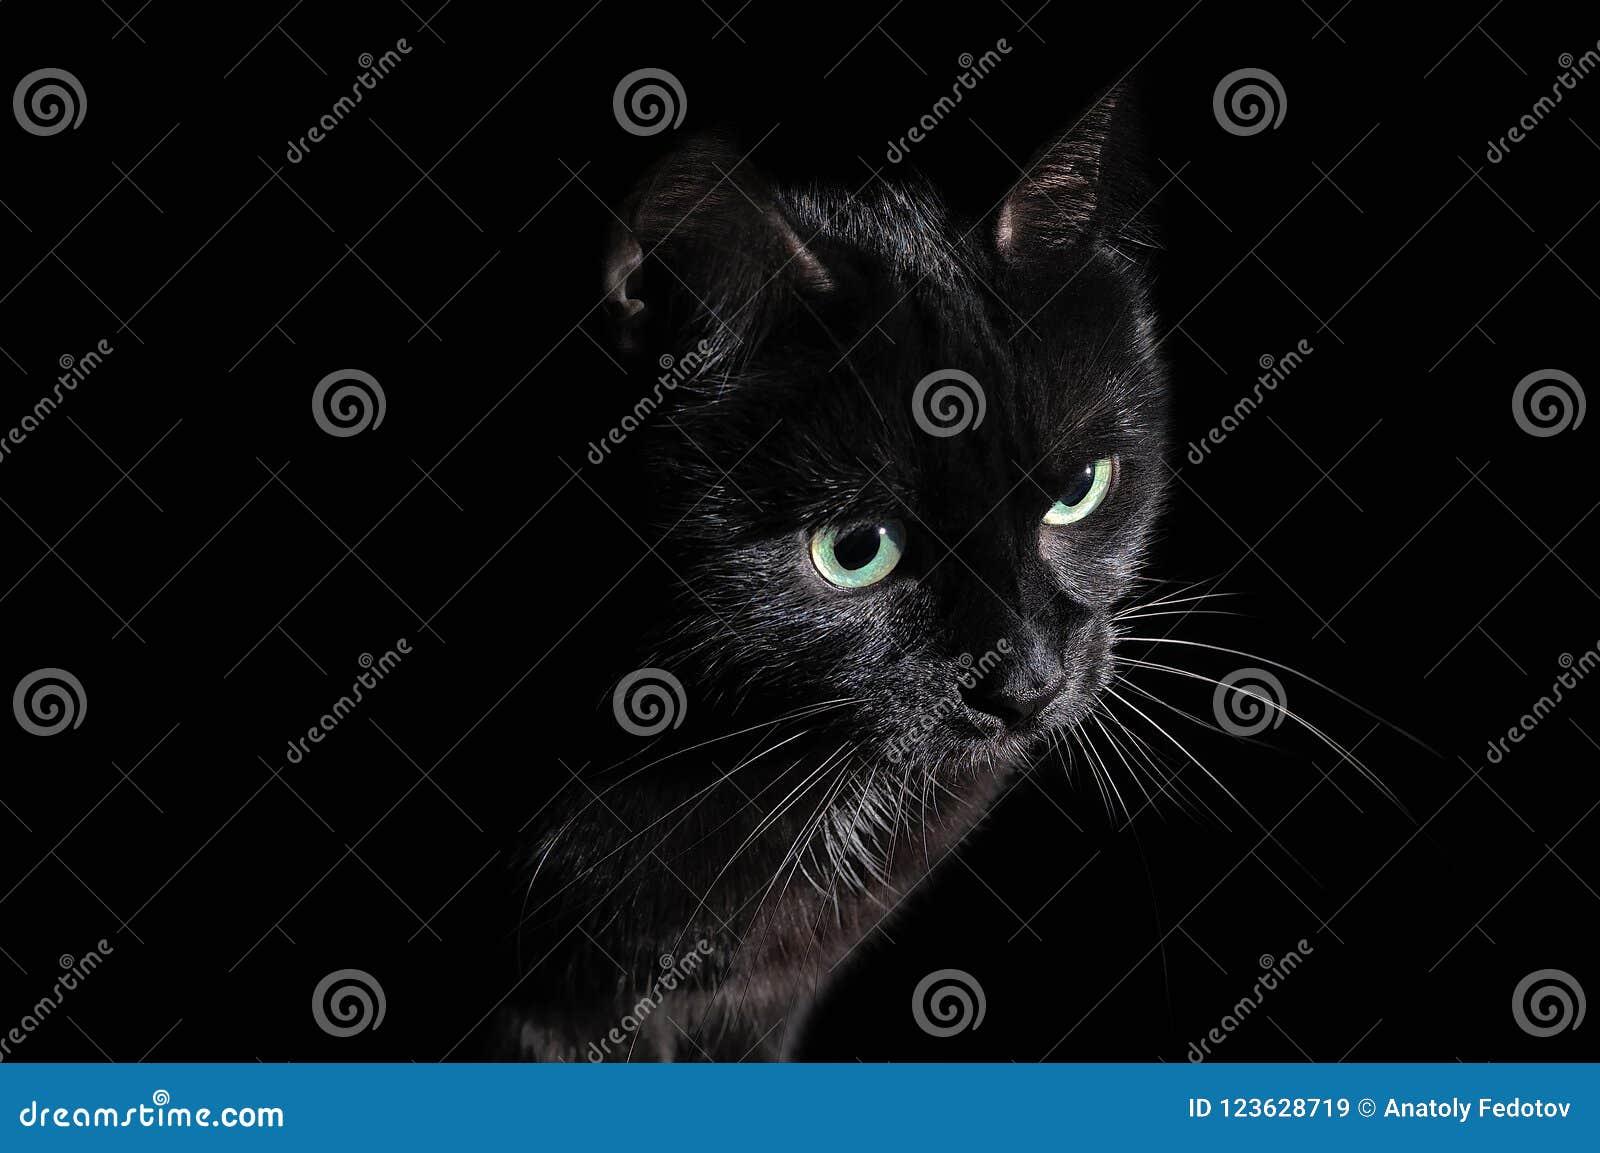 Postcard for Halloween: portrait of a black cat